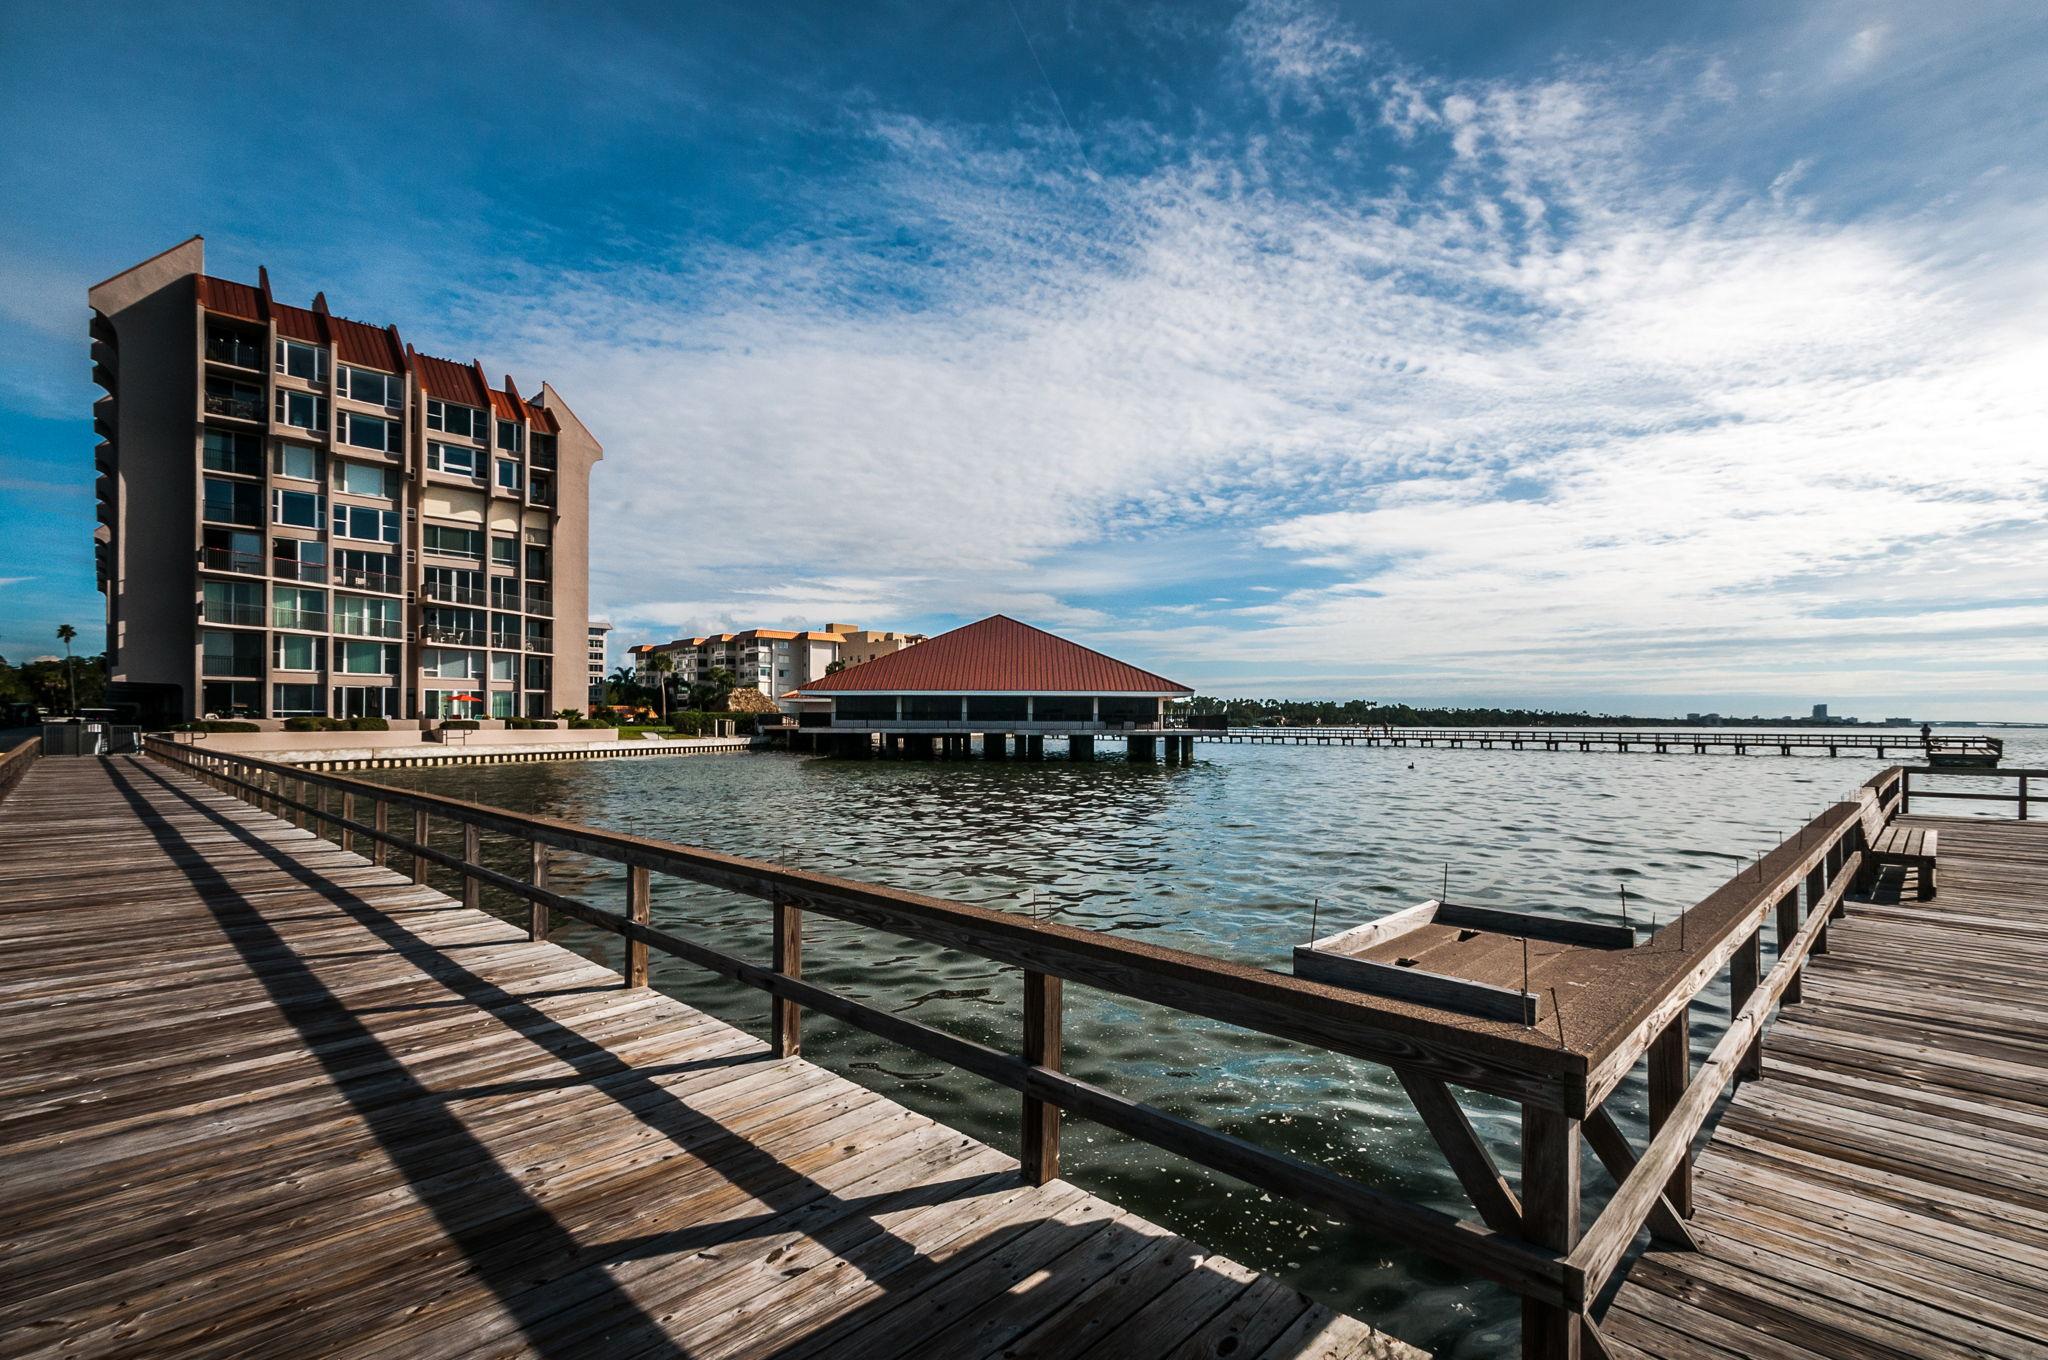 71-Community Dock